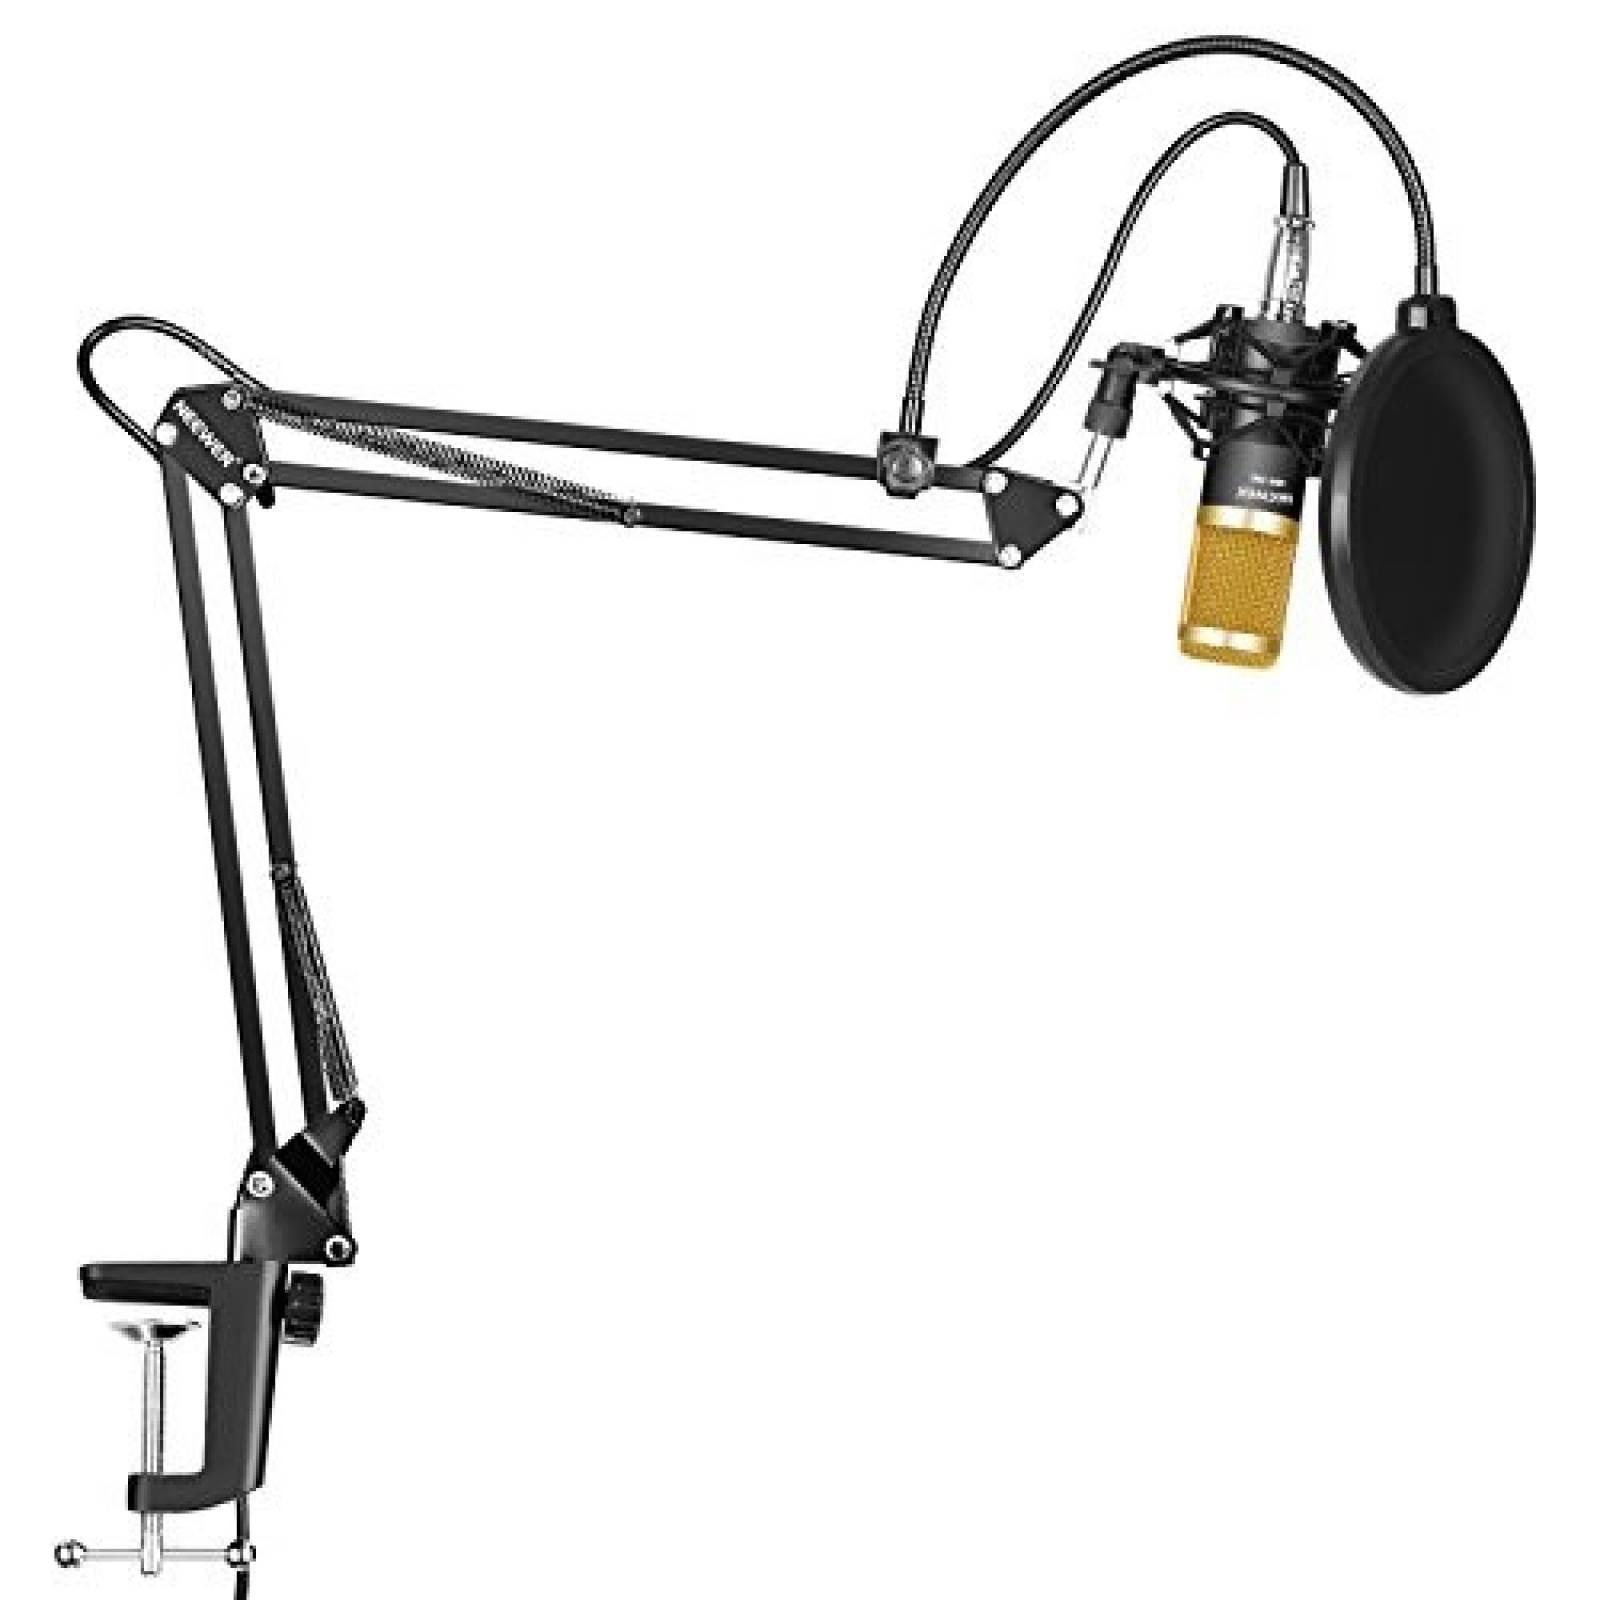 Kit de micrófono condensador Neewer Pro para radio